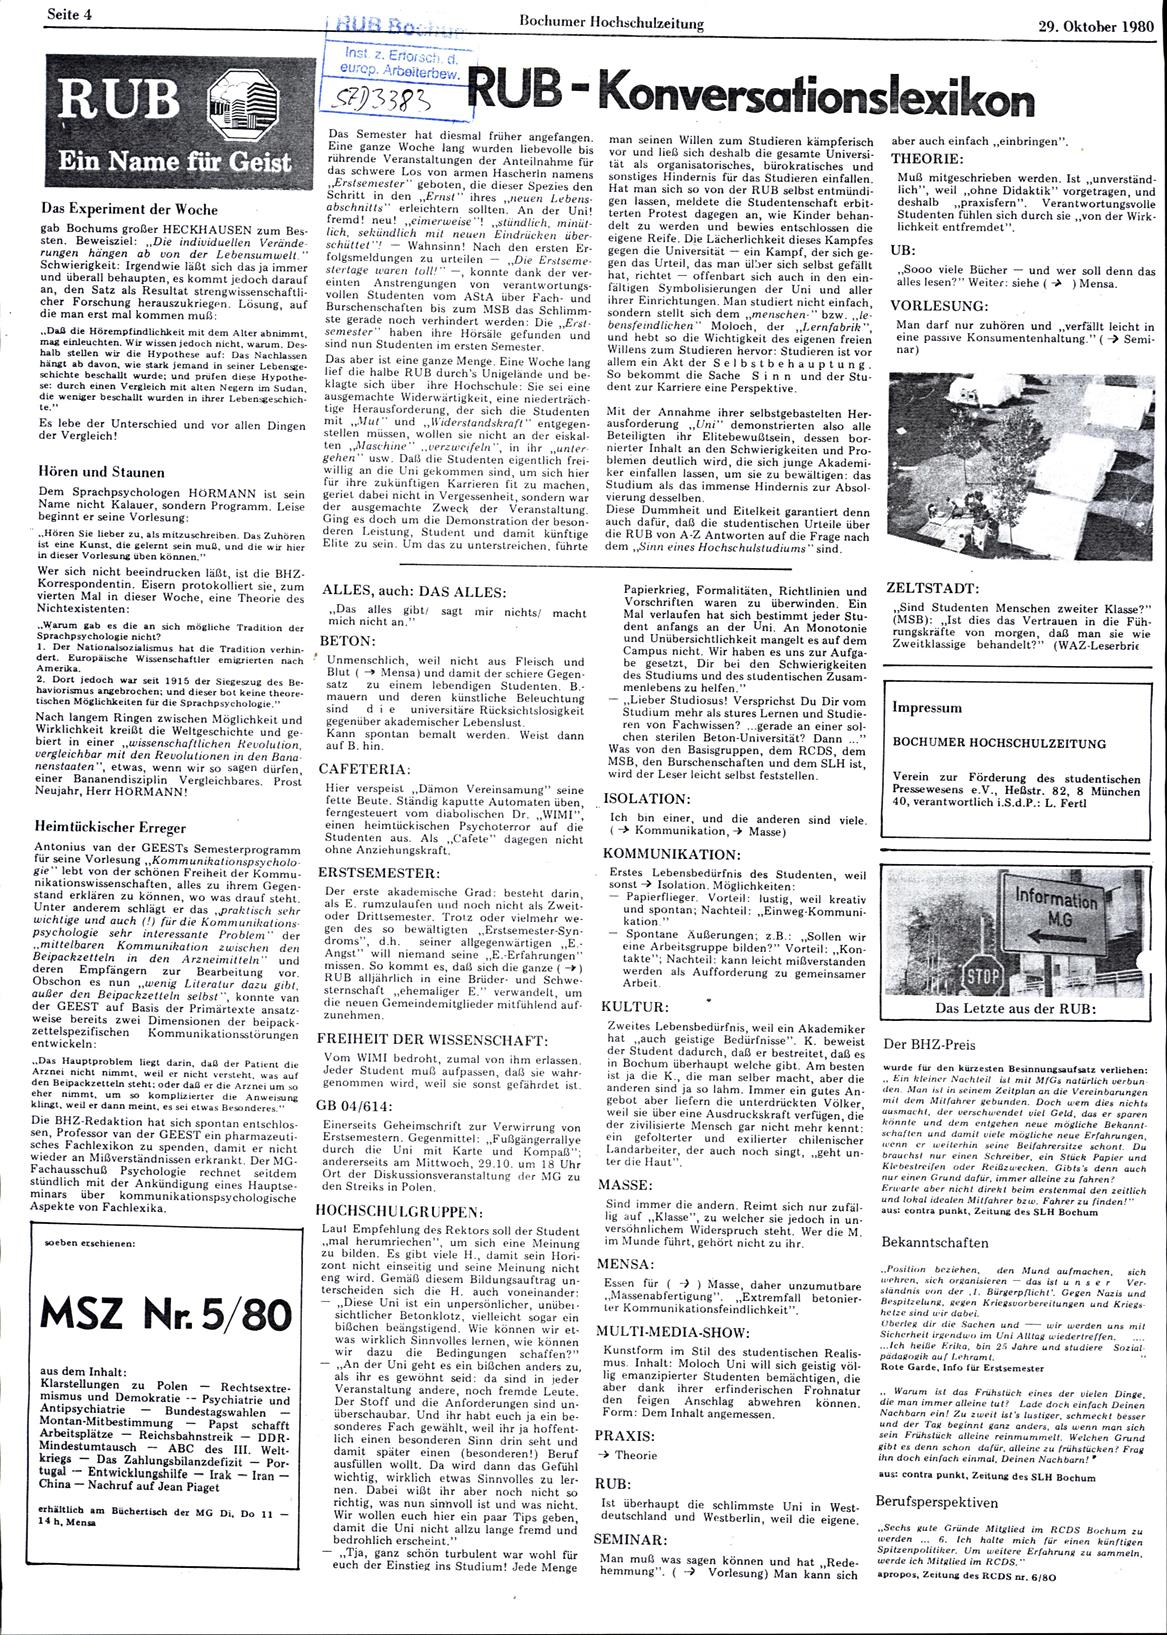 Bochum_BHZ_19801029_019_004